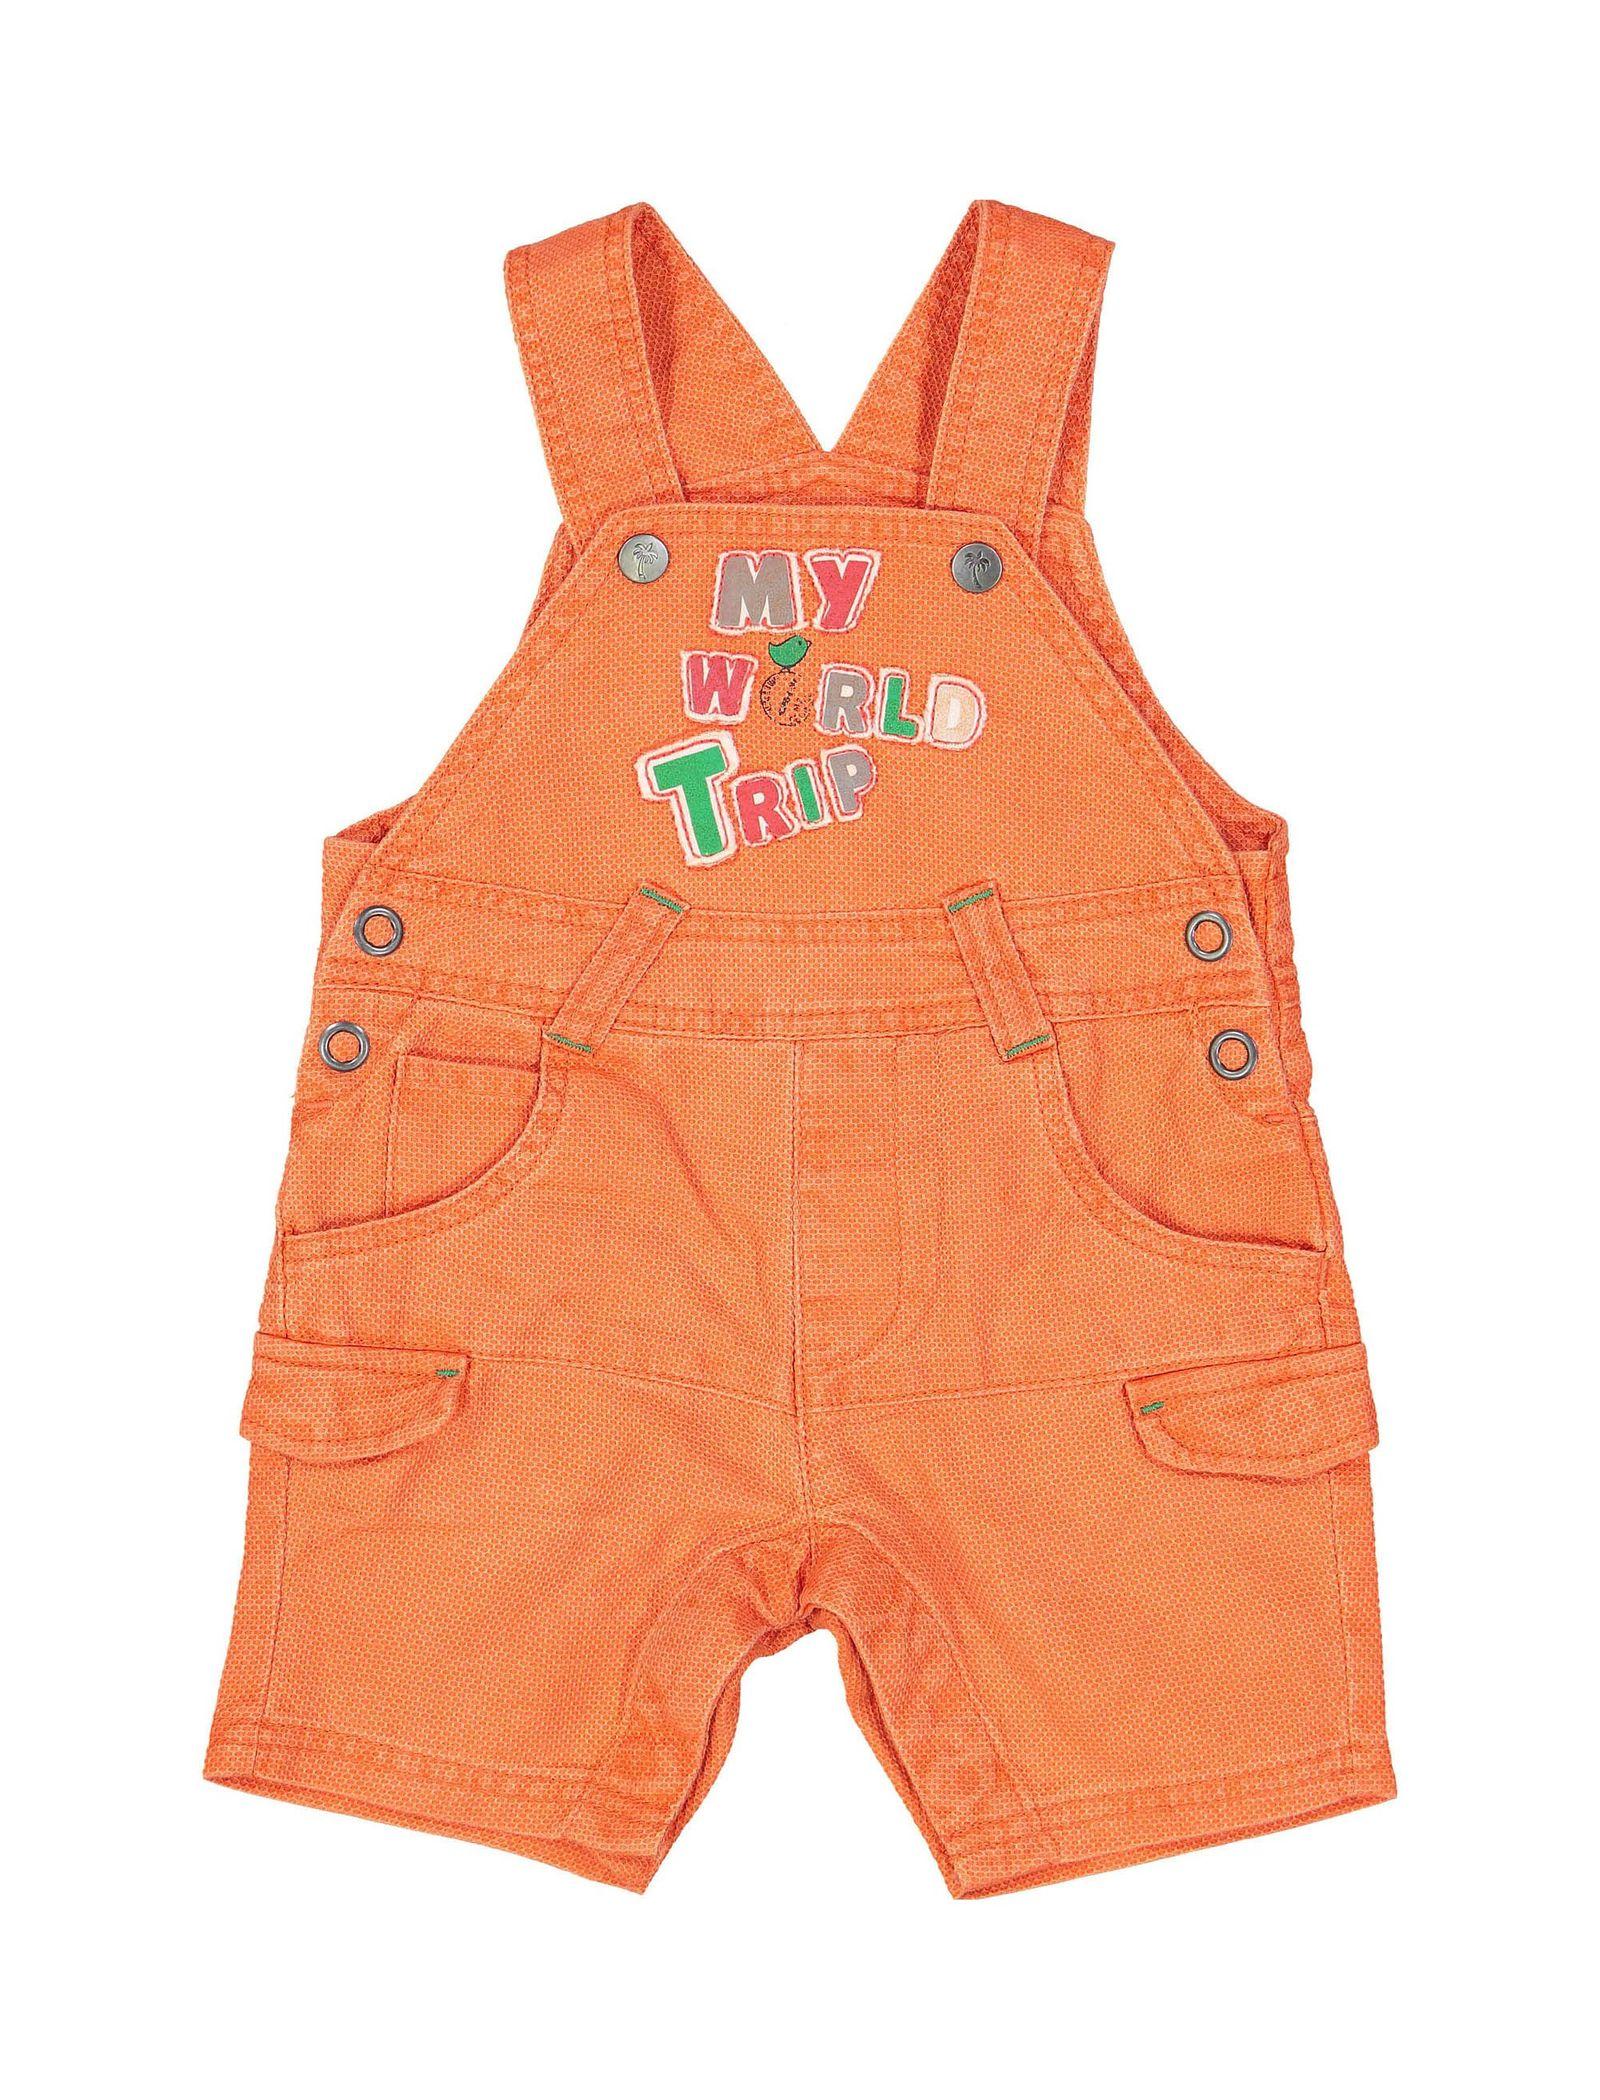 سرهمی نخی نوزادی پسرانه - ارکسترا - نارنجي  - 1